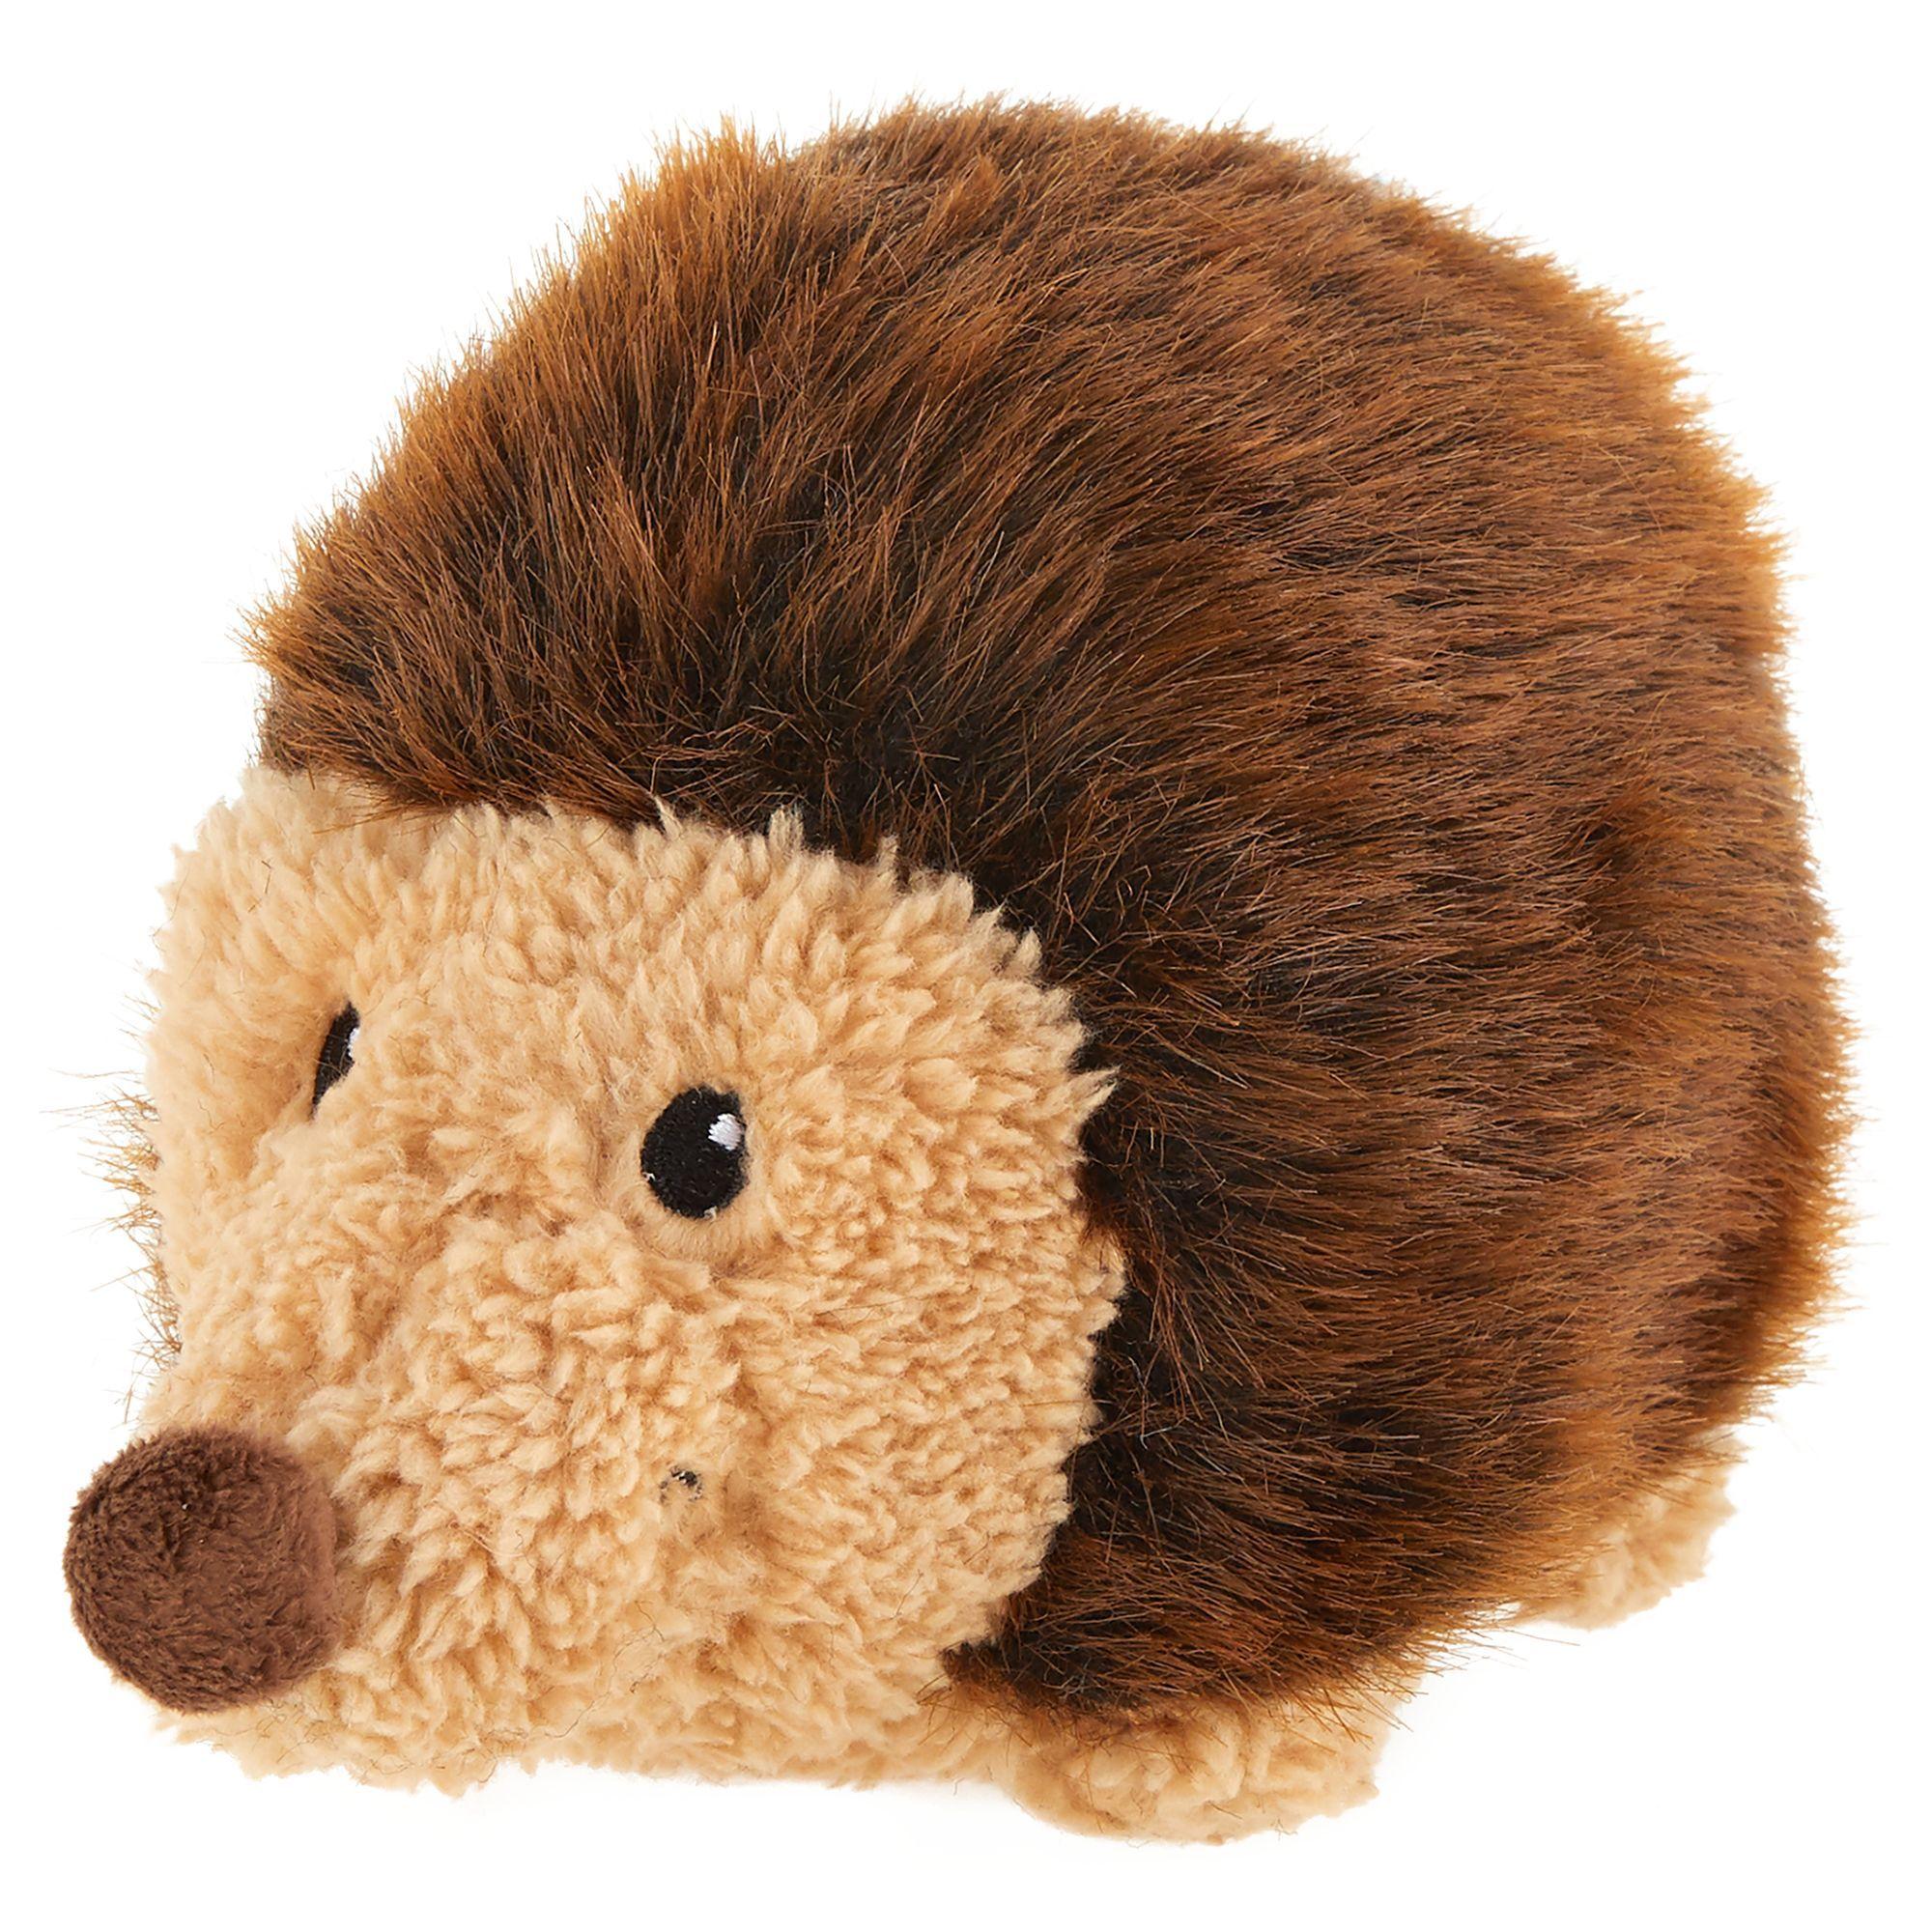 Top Paw Hedgehog Dog Toy Plush Squeaker Size Medium Black